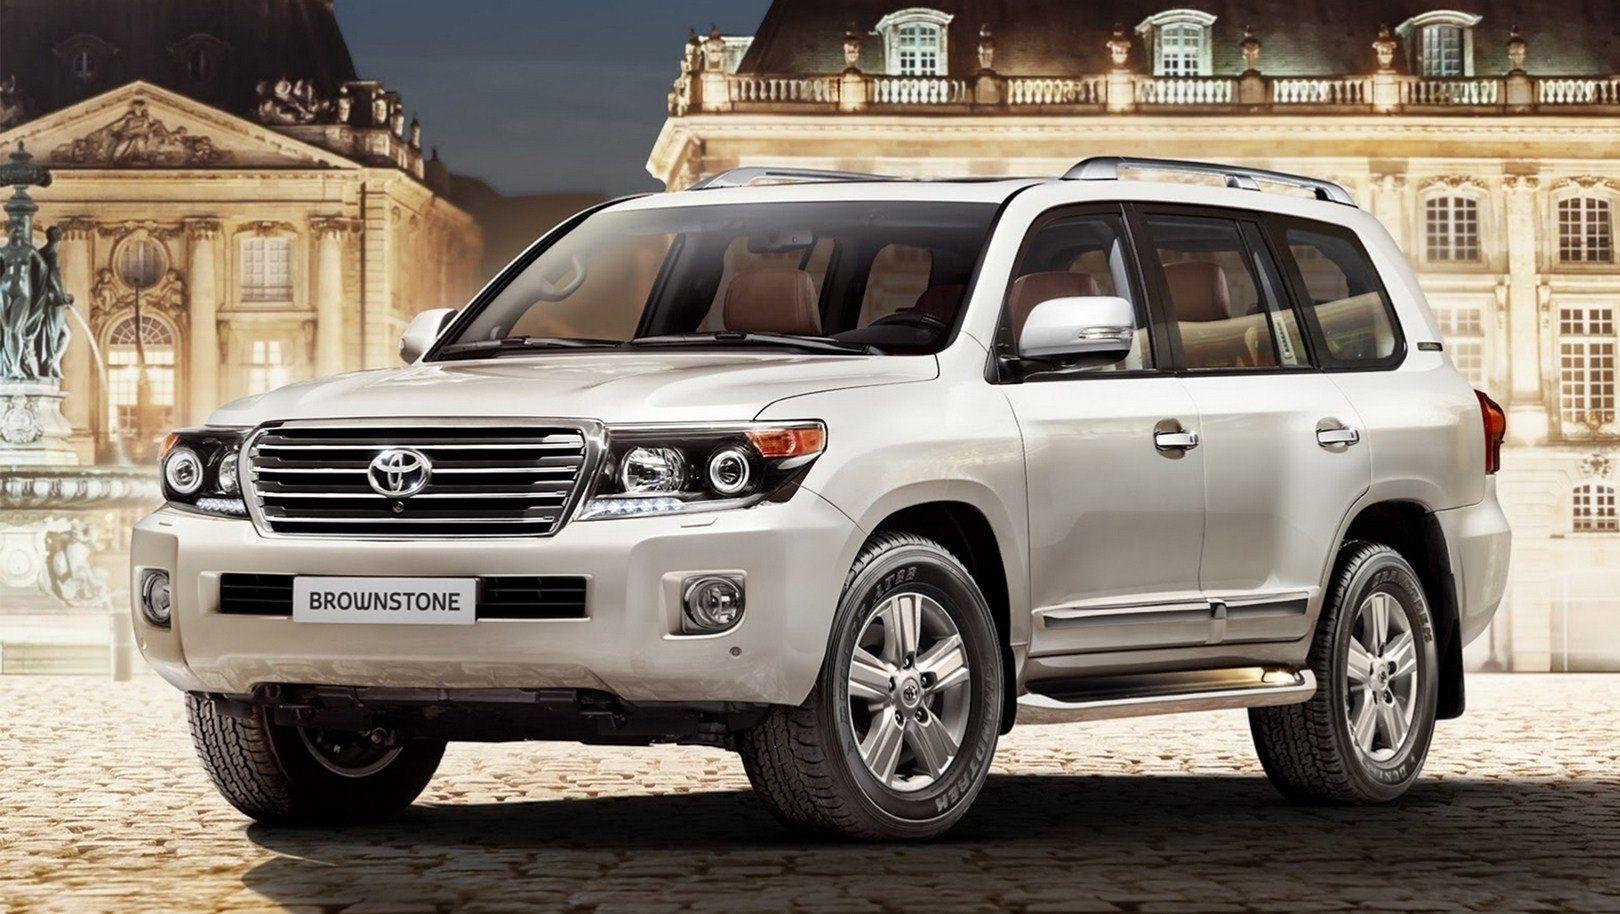 2020 Land Cruiser Exterior And Interior Review Toyota